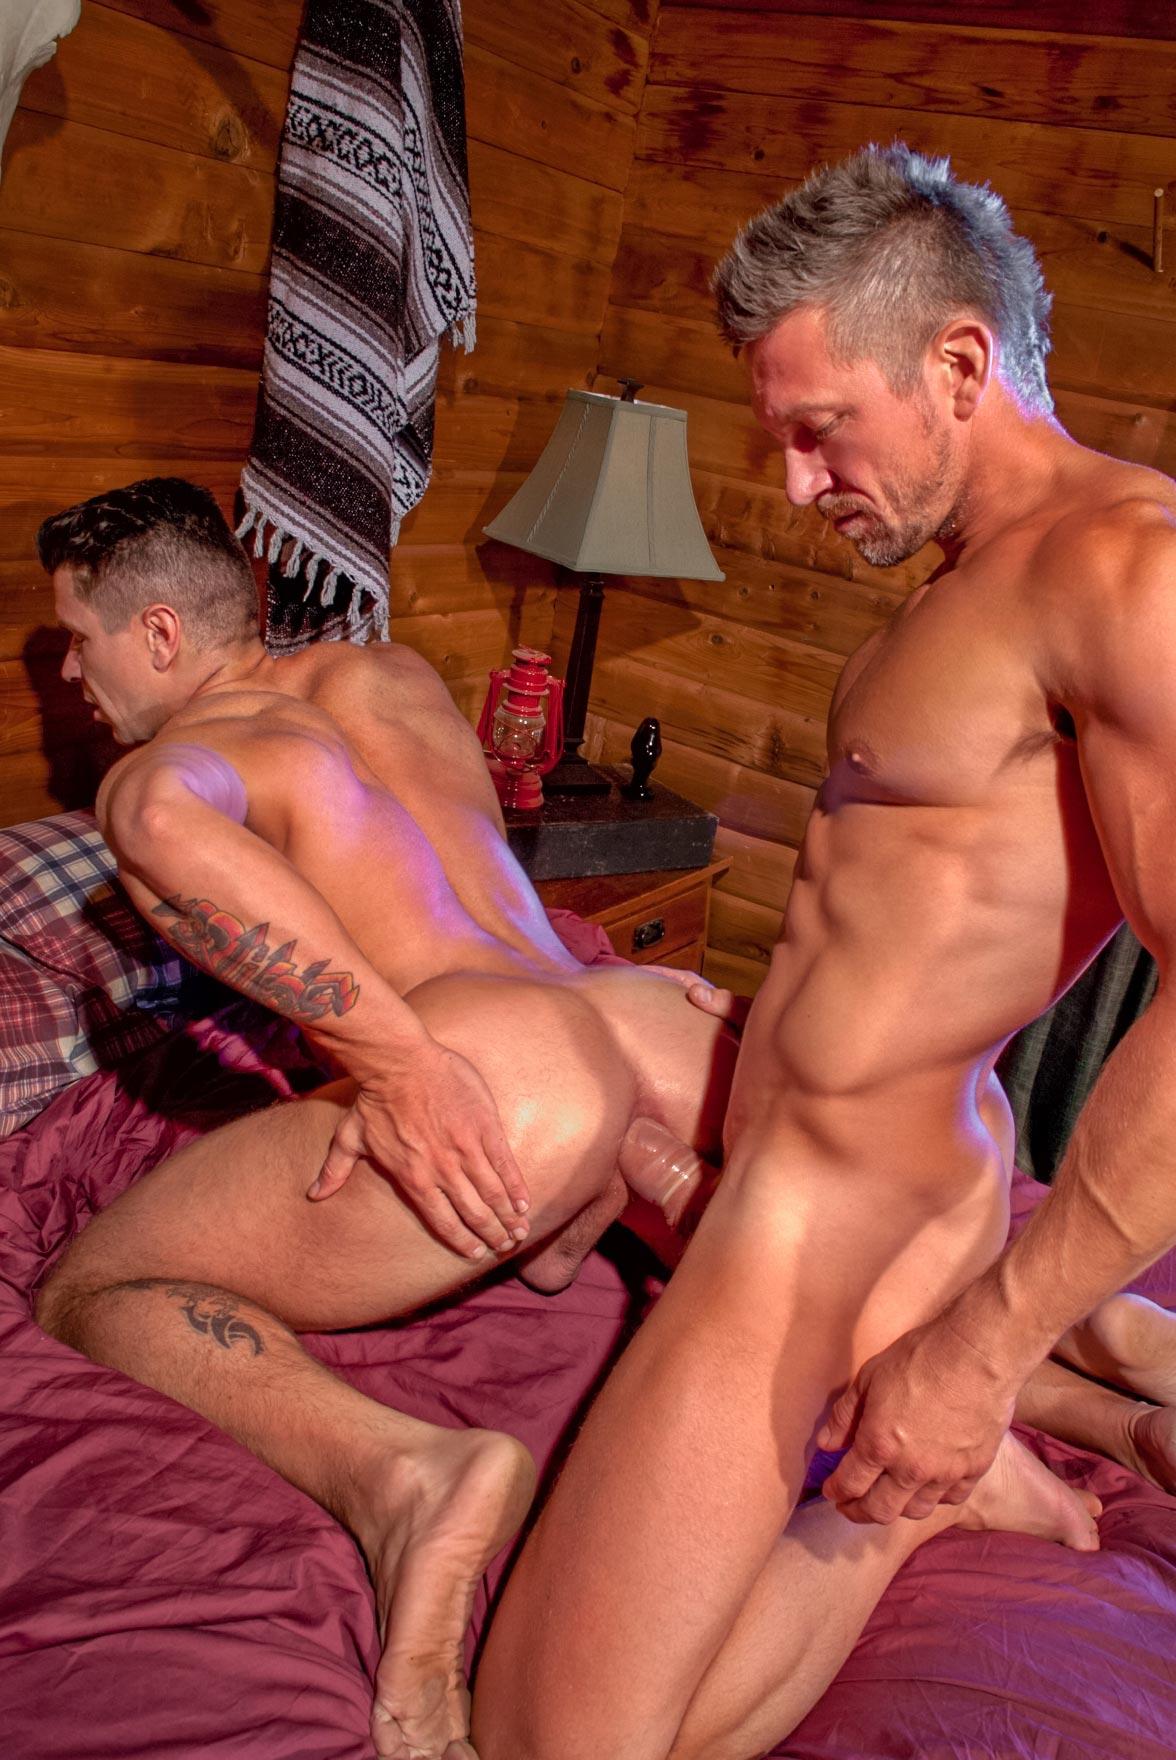 porno gay madrid escorts ni